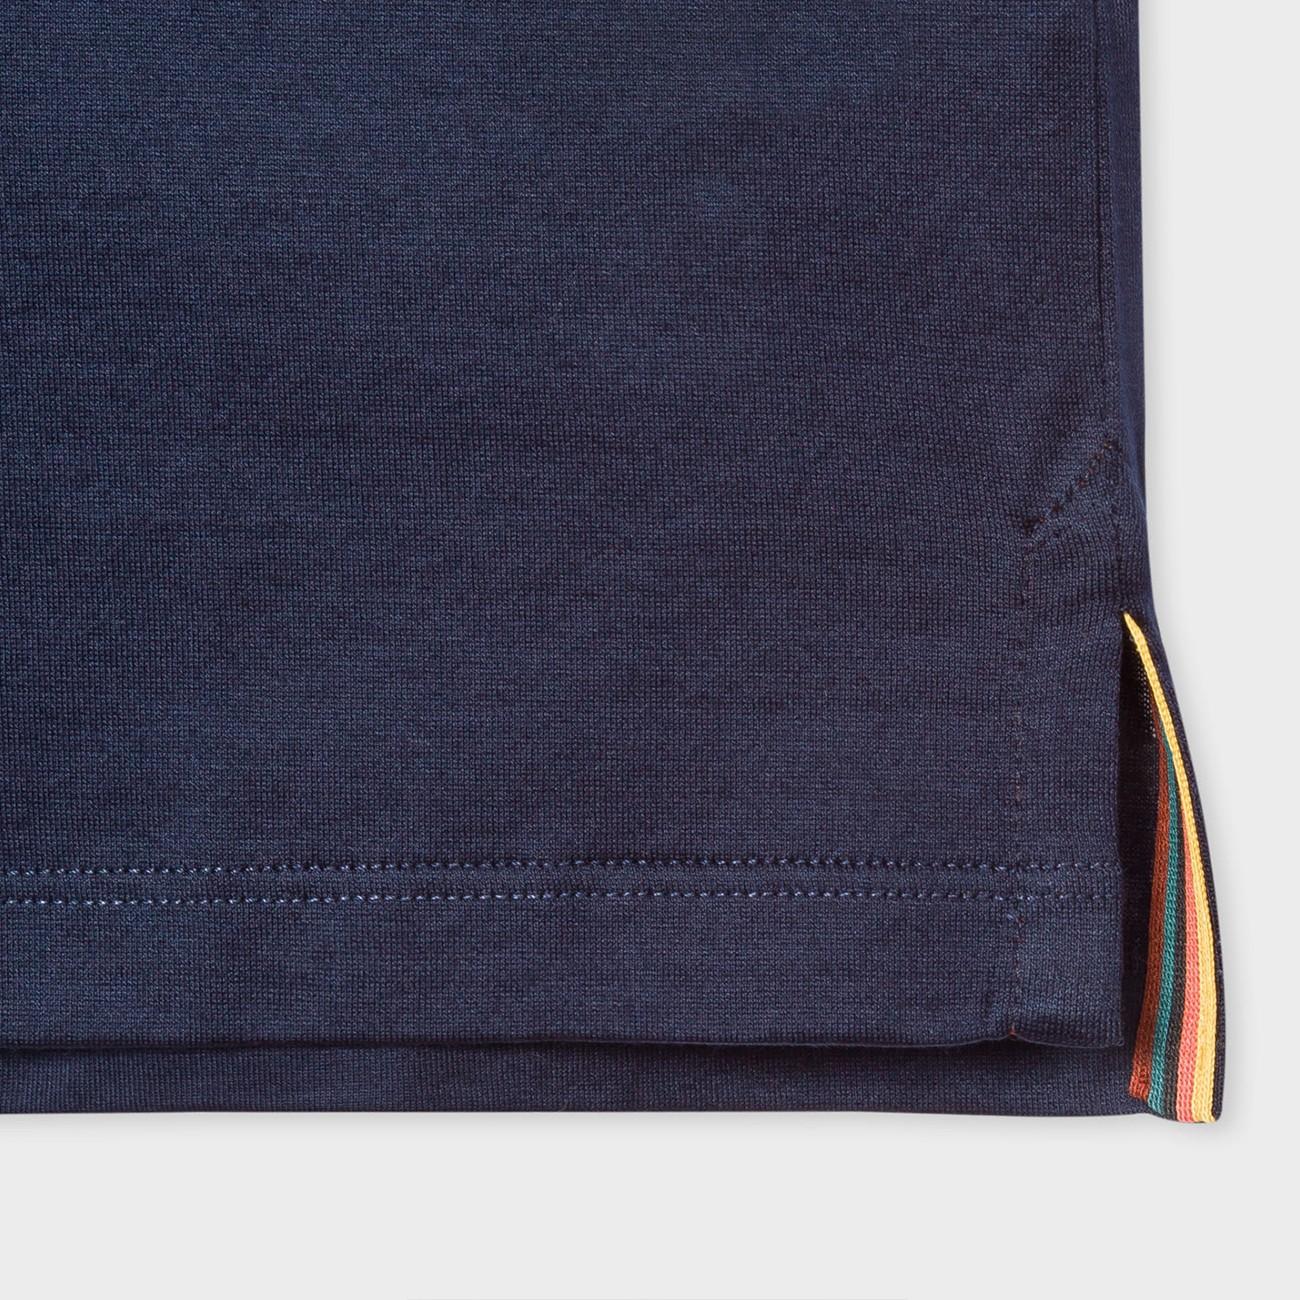 DARK NAVY BLUE T-SHIRT TRIMS ARTIST STRIPE PAUL SMITH M1R-348S-D00088-49